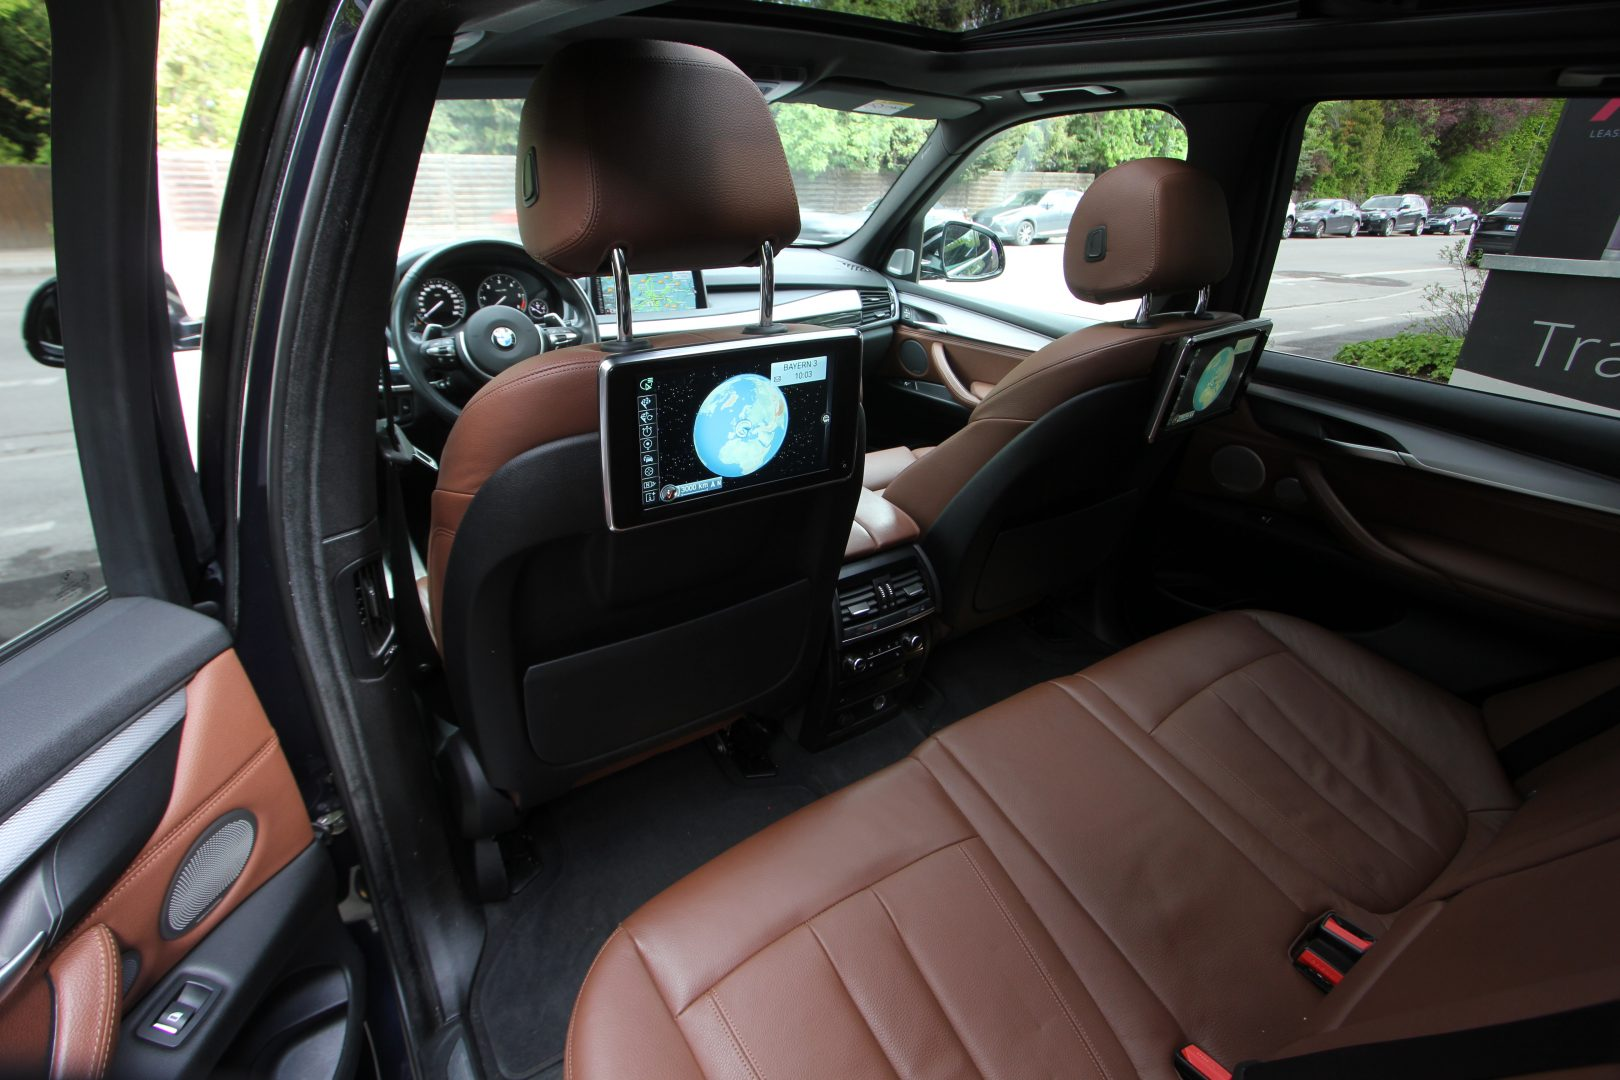 AIL BMW X5 M50d Bang & Olufsen Panorama RSE 10